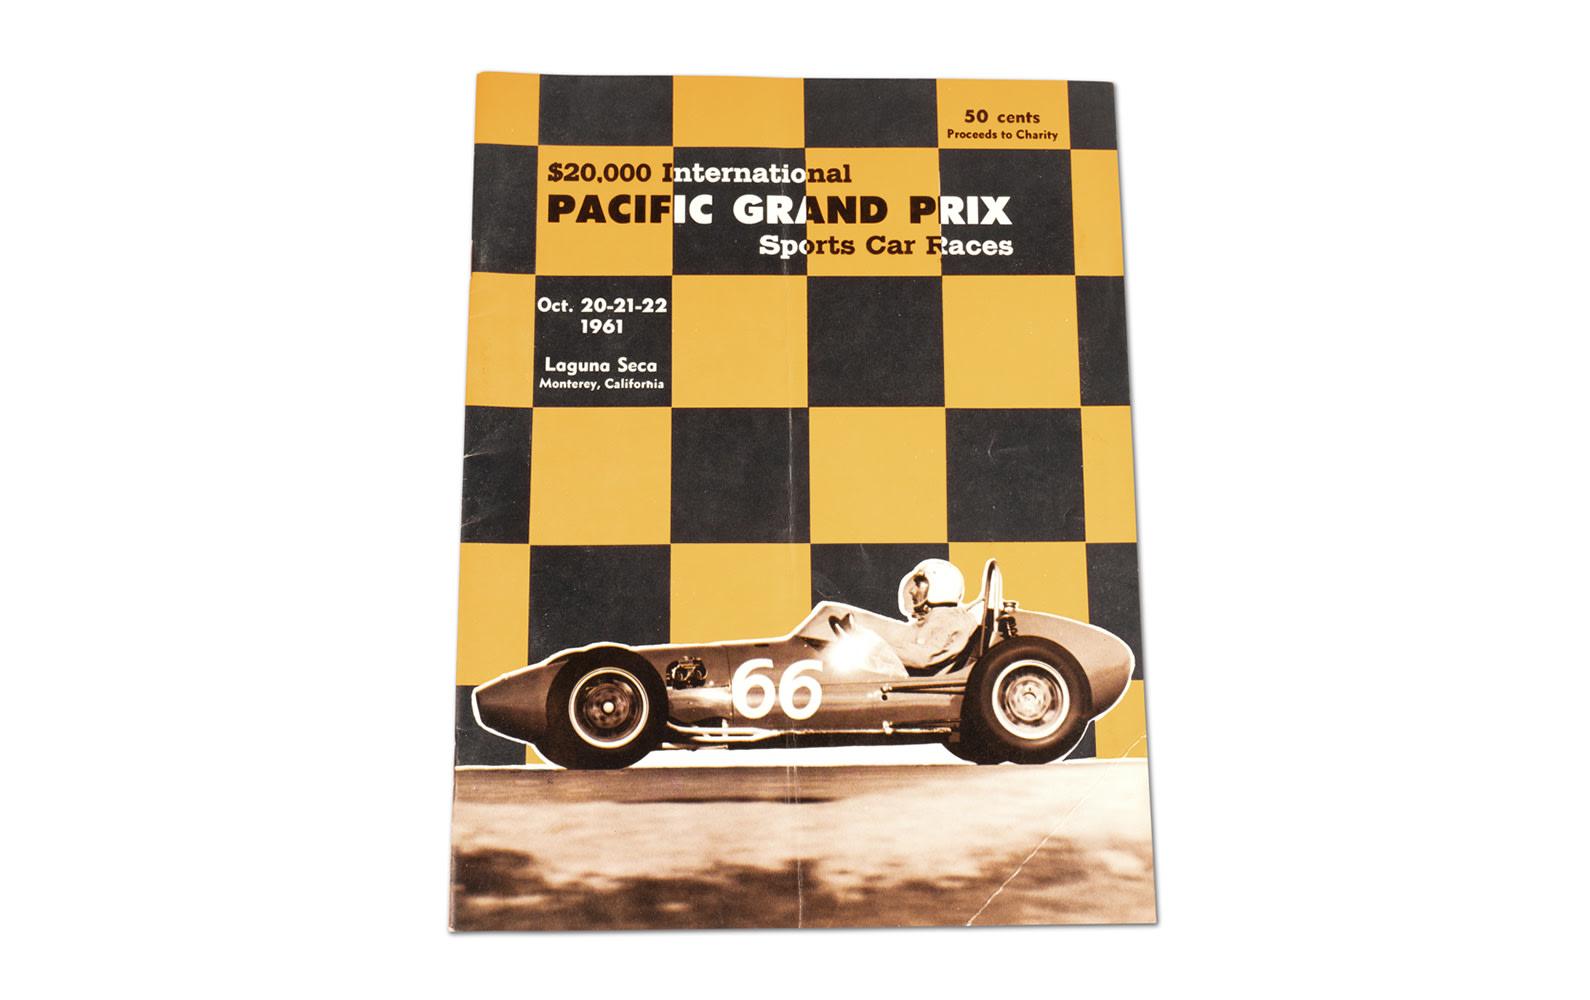 1961 Pacific Grand Prix Sports Car Races at Laguna Seca Official Race Program